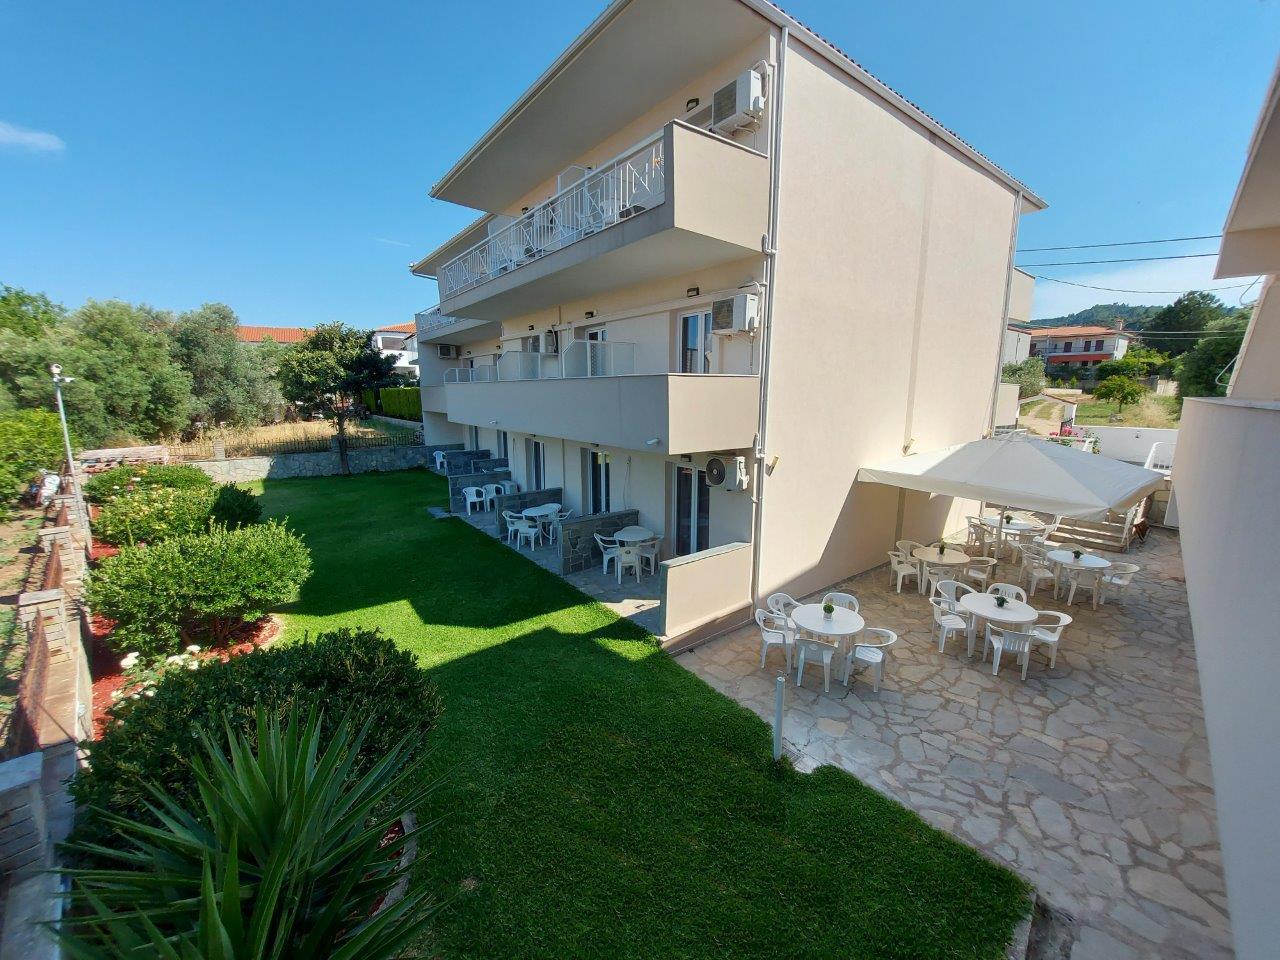 Grcka apartmani letovanje, Polihrono Halkidiki, Green Gardens, kuća B, pogled na travnjak ispred kuće